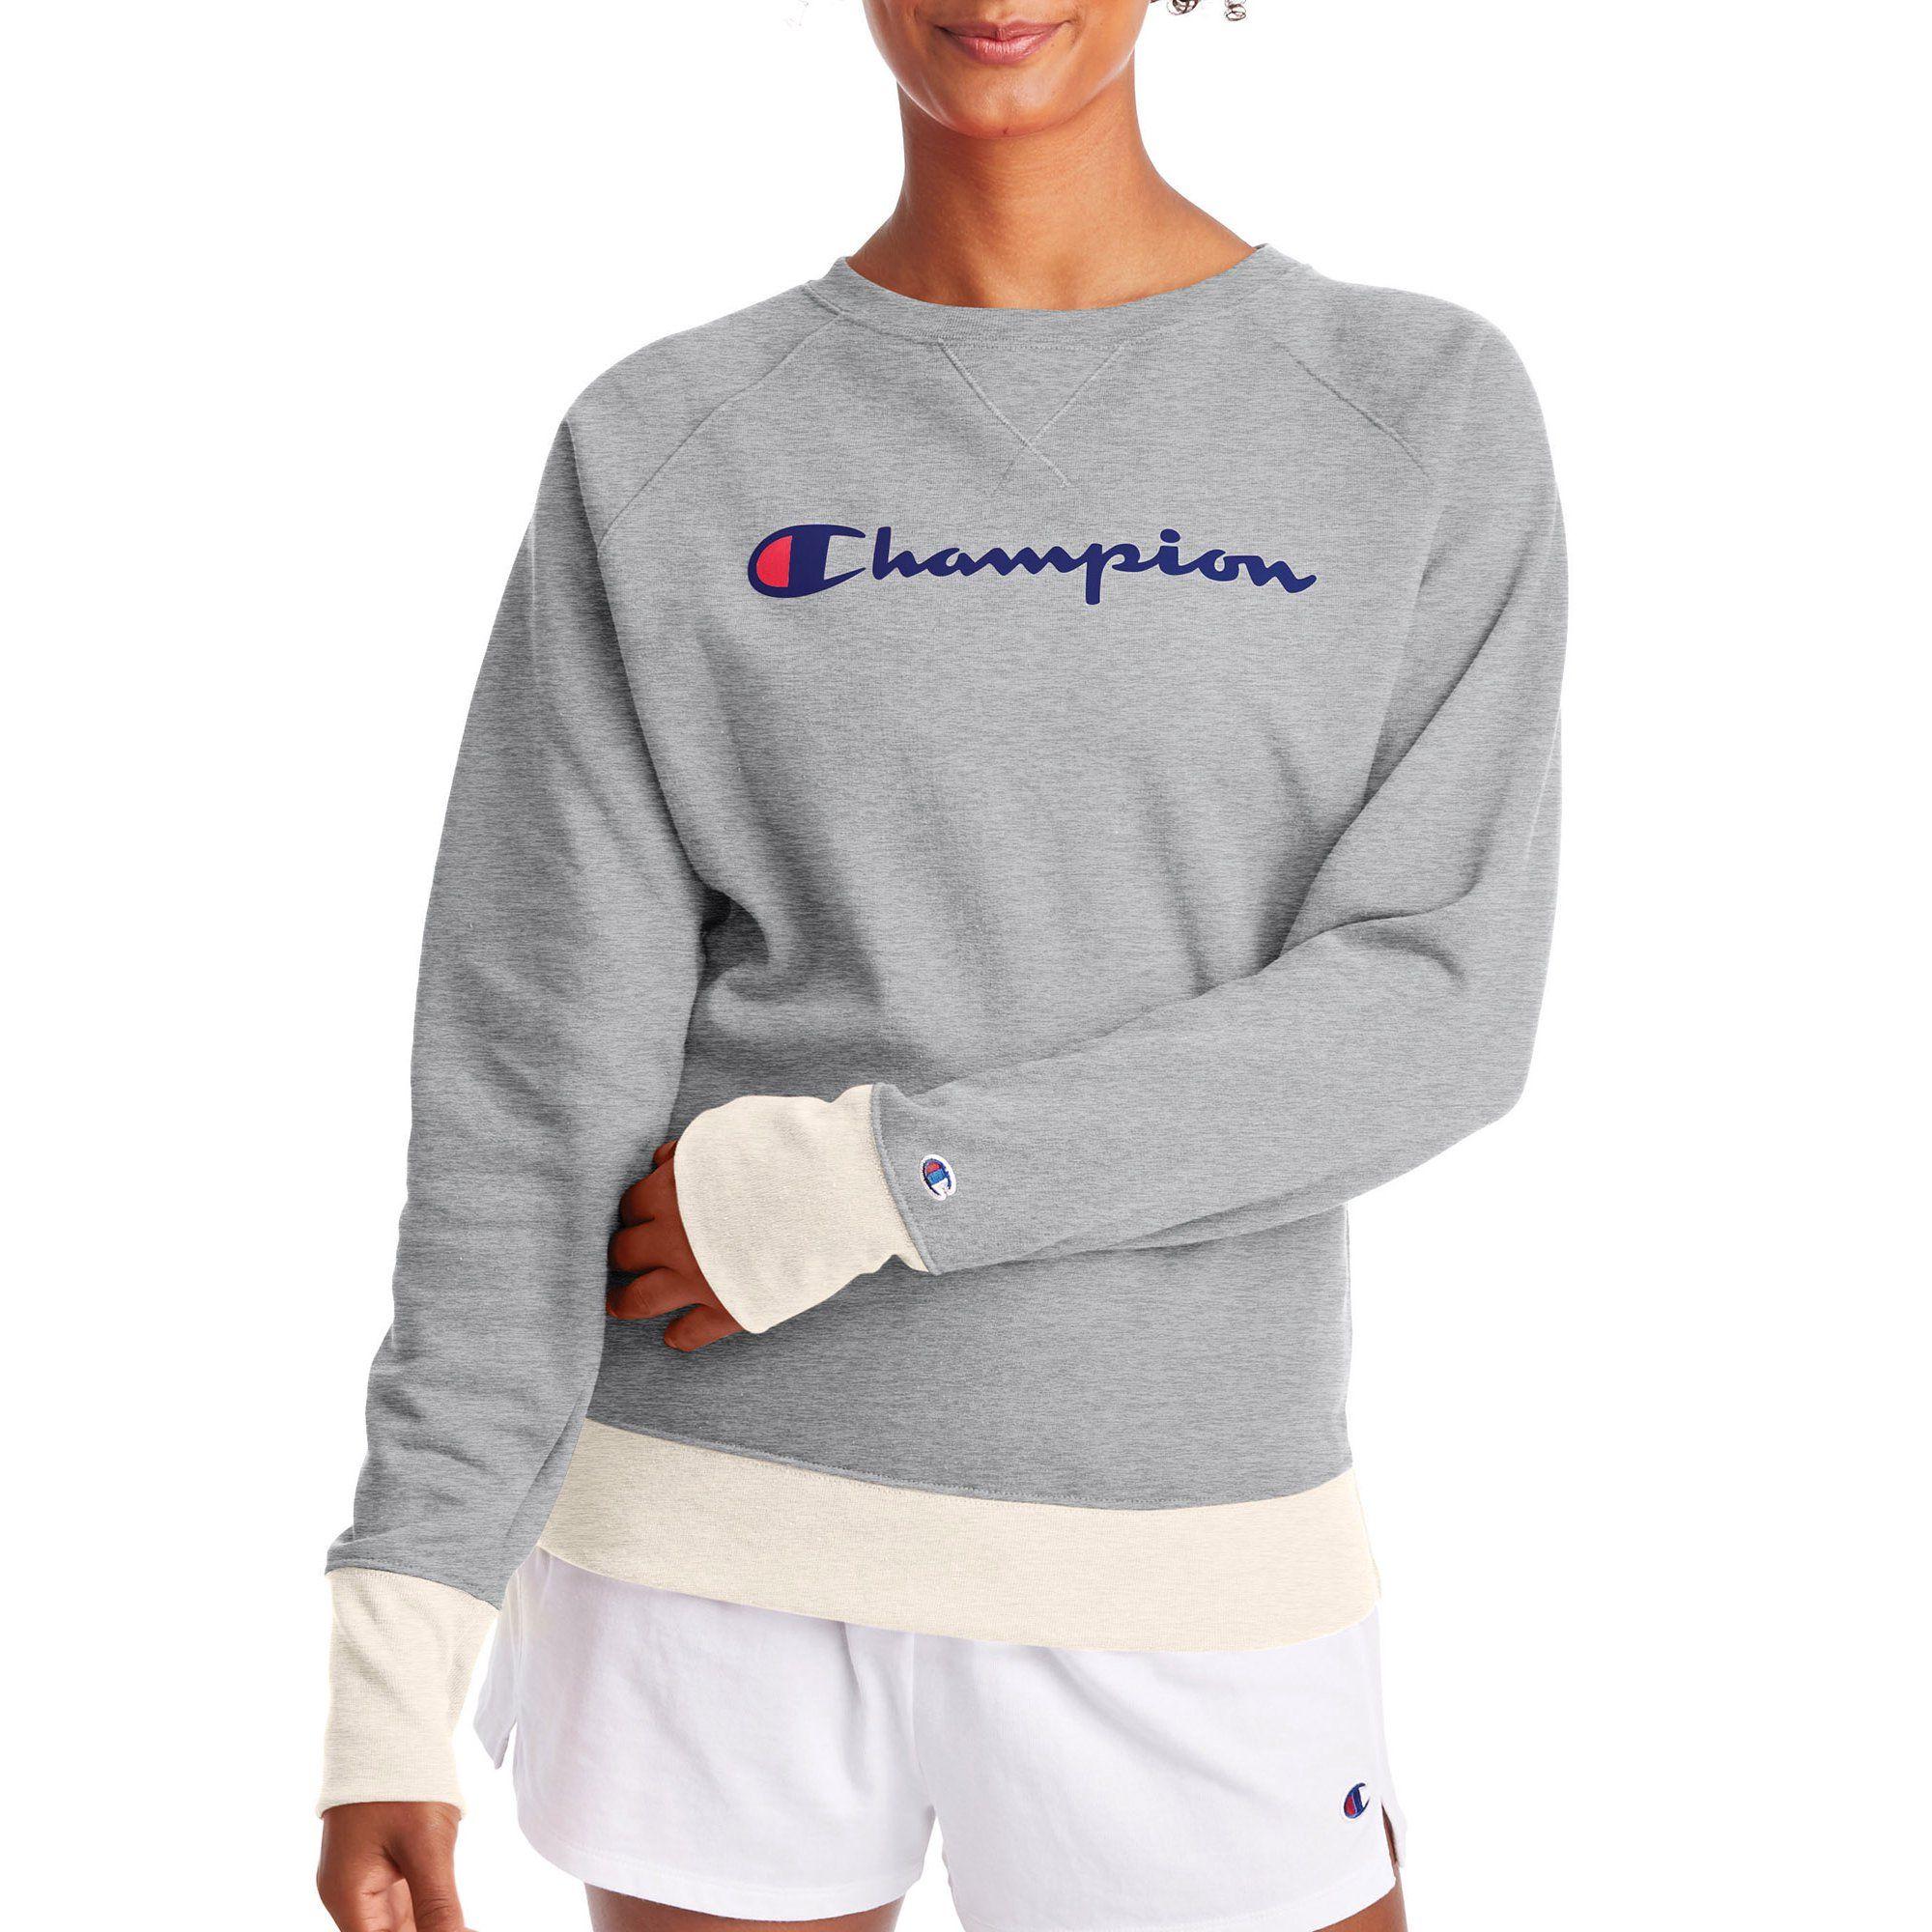 Champion Champion Women S Powerblend Fleece Boyfriend Crew Neck Sweatshirt Graphic Walmart Com Walmart Com Sweatshirts Crew Neck Sweatshirt Clothes [ 2000 x 2000 Pixel ]